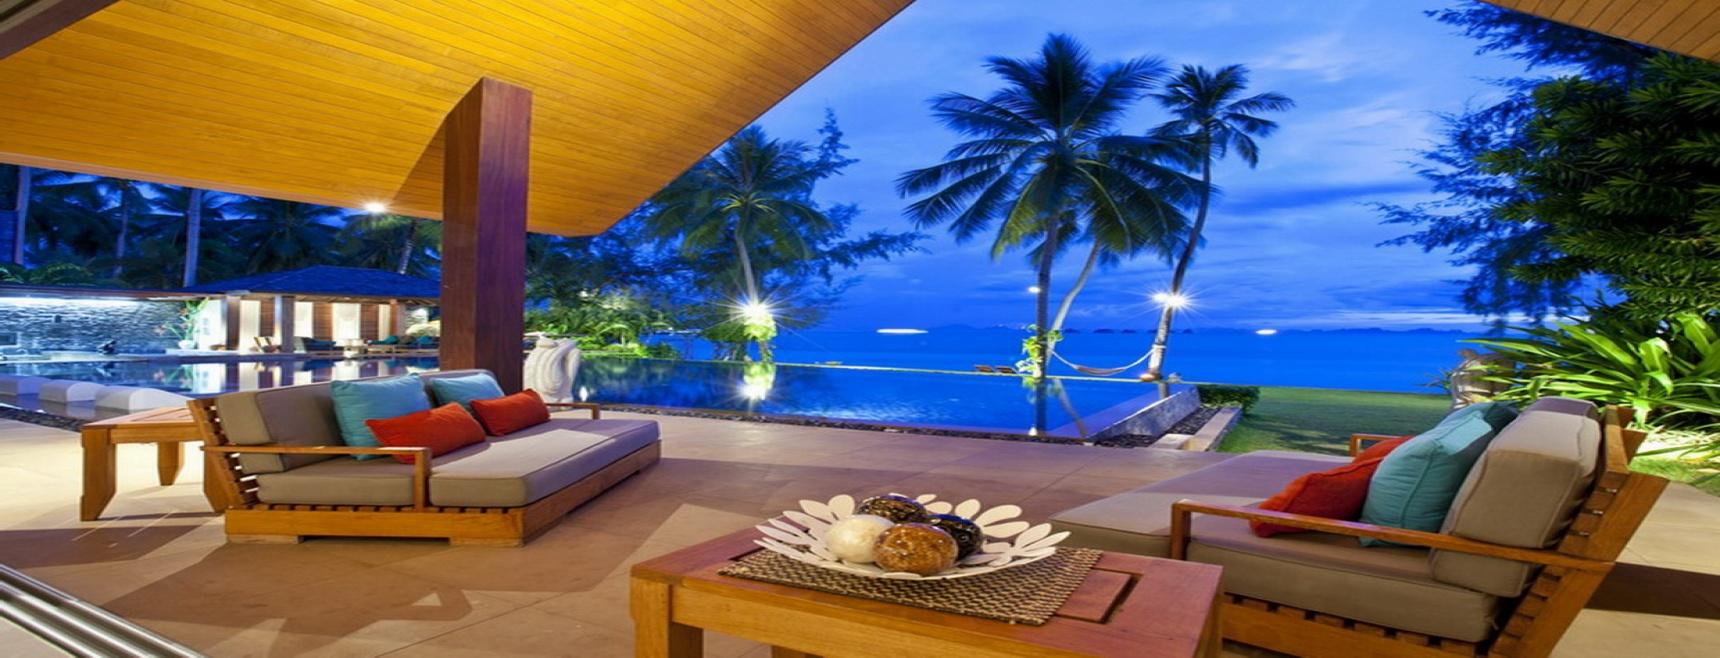 8 Bedrooms, Villa, Holiday Villa Rentals, Listing ID 1332, Lipa Noi, South West, Koh Samui,